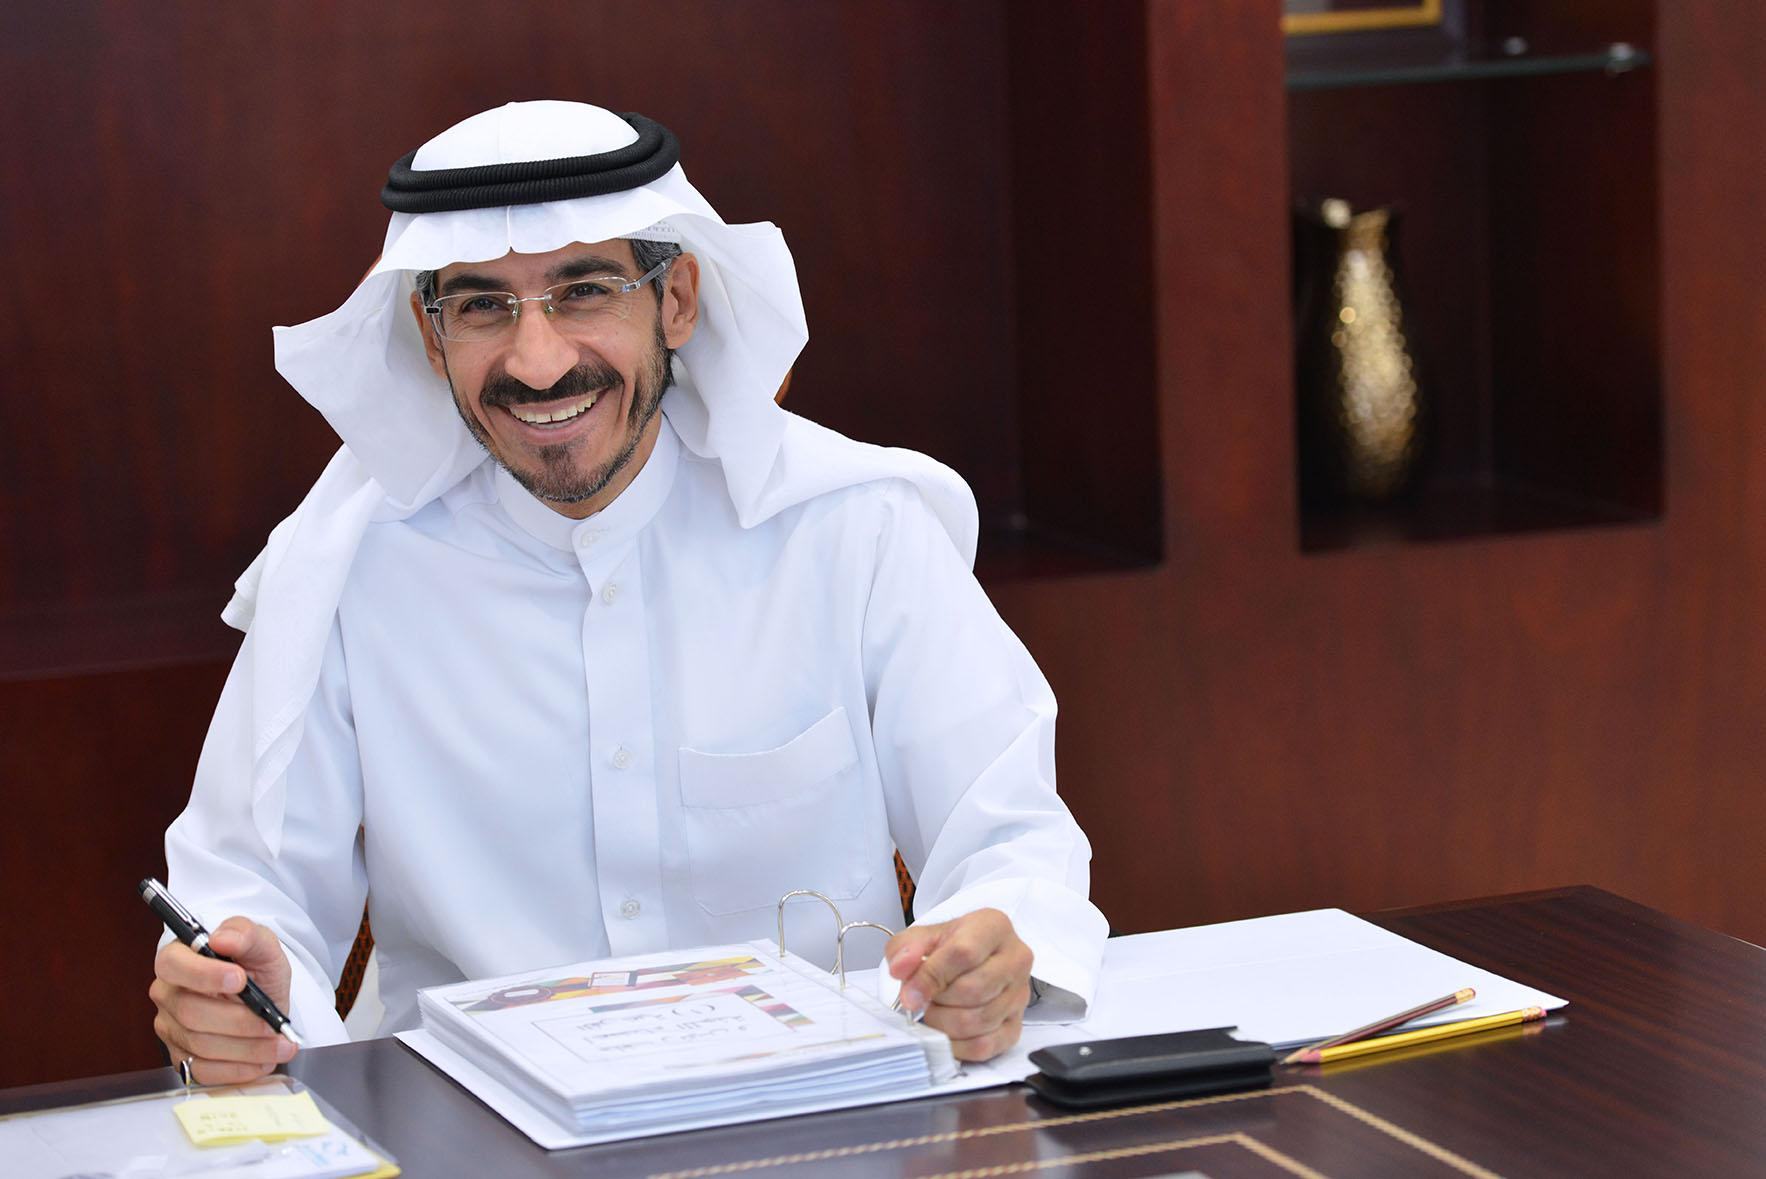 Dr. Abdullah Al Kadi